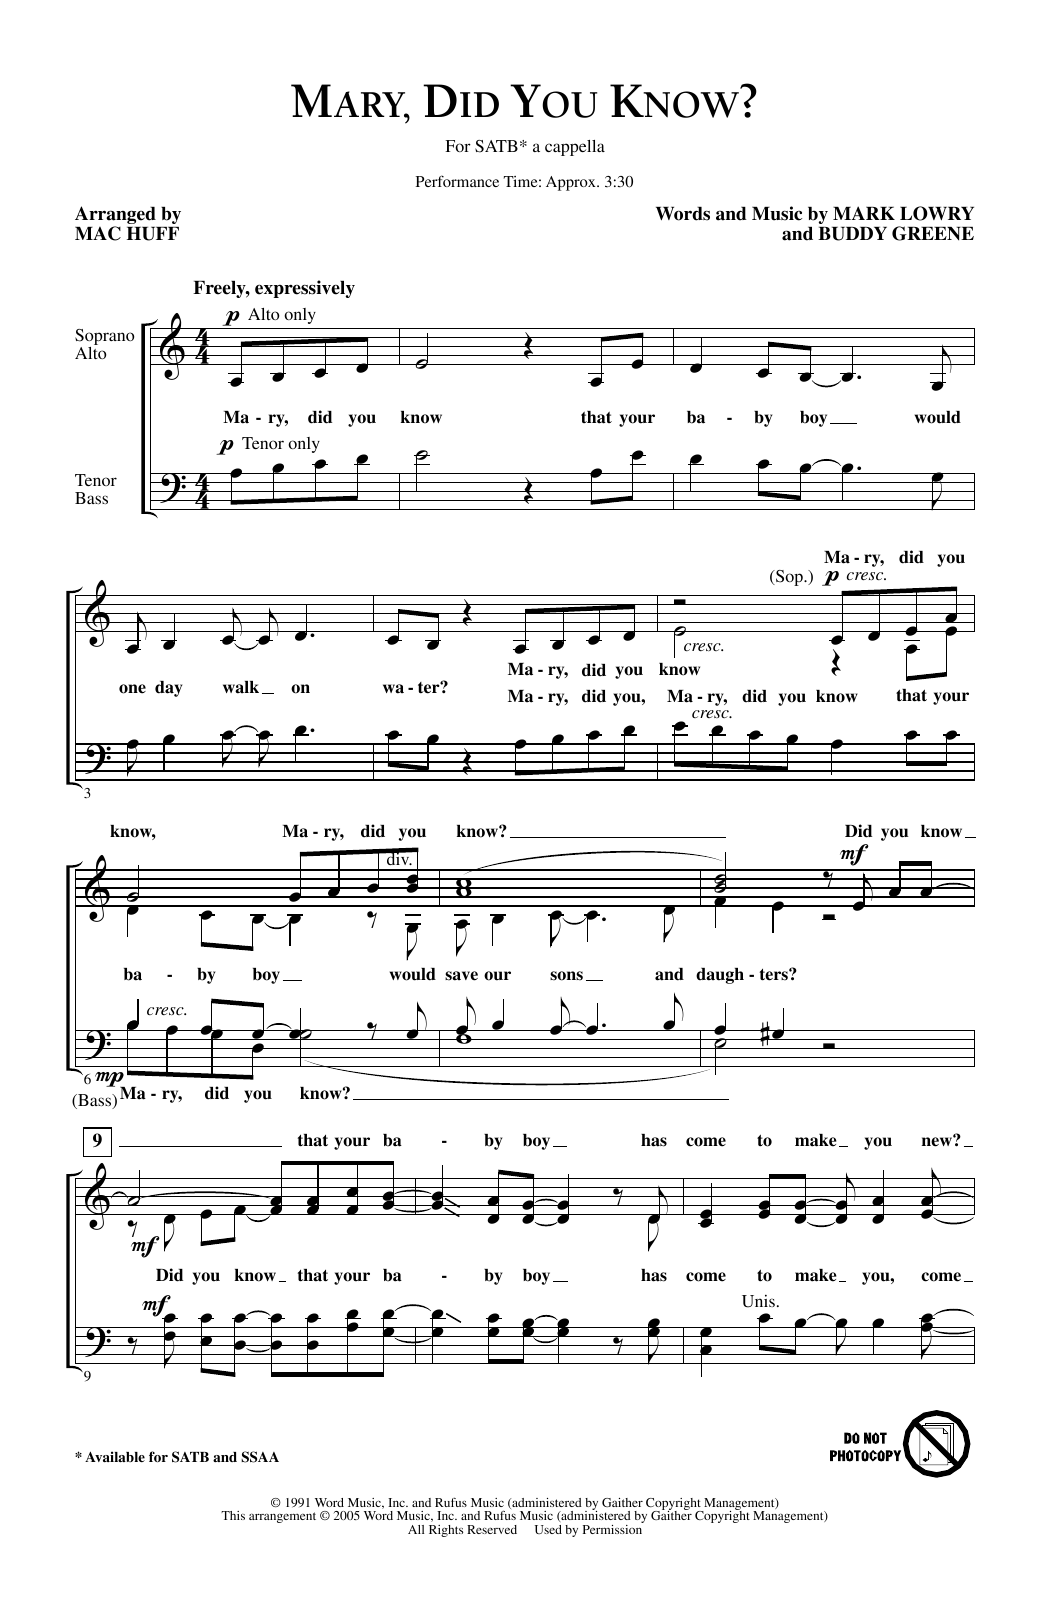 Sheet Music Digital Files To Print - Licensed Kathy Mattea Digital Sheet Music